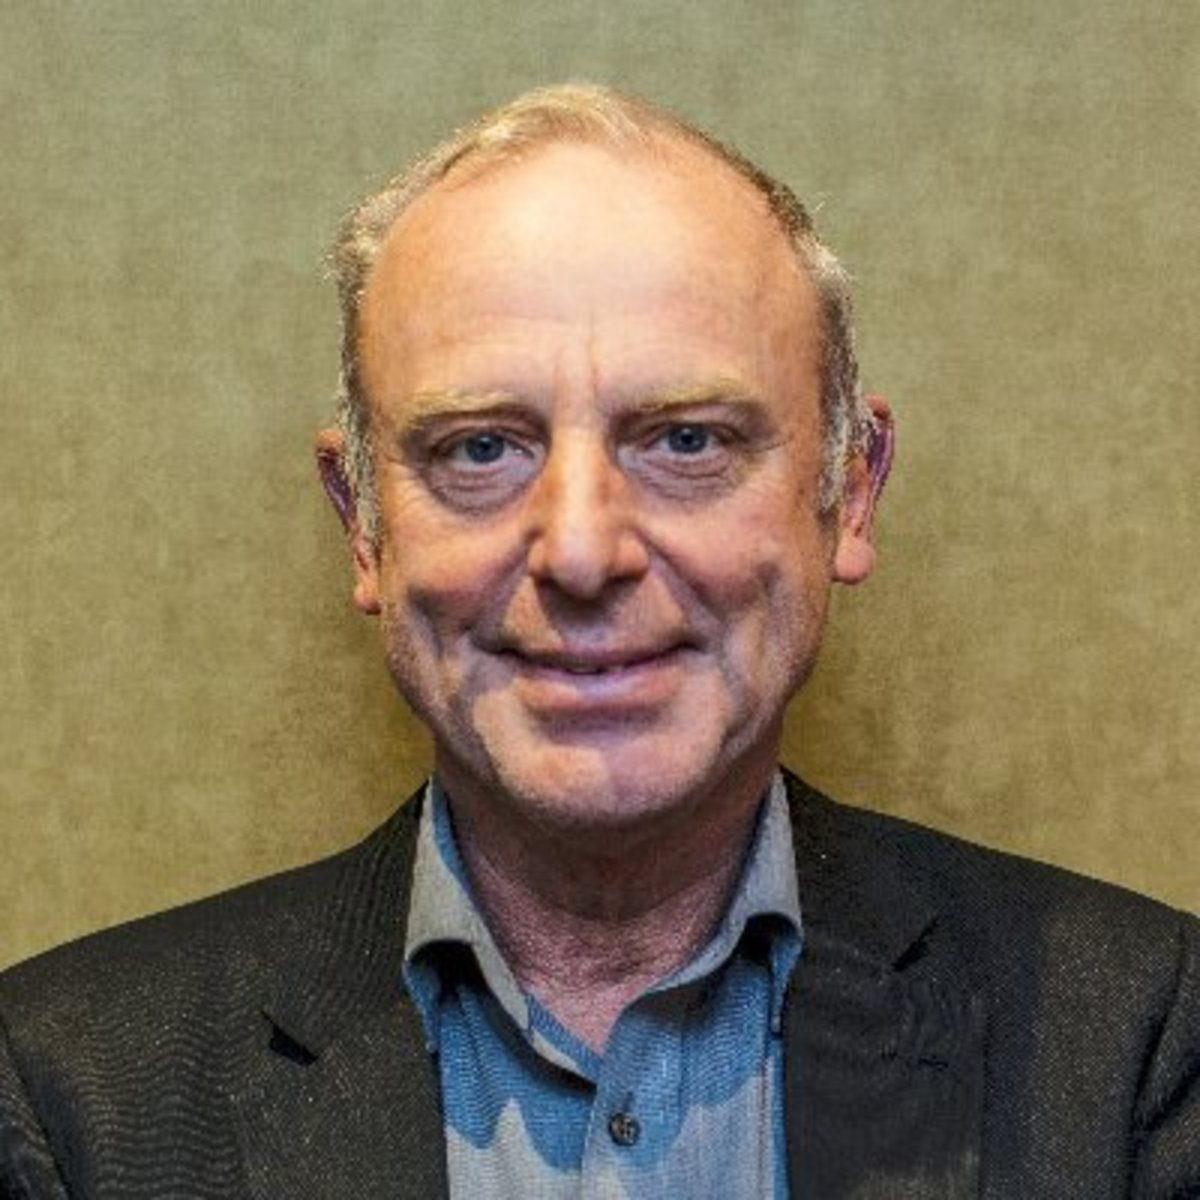 Professor Sikora Covid Vaccine